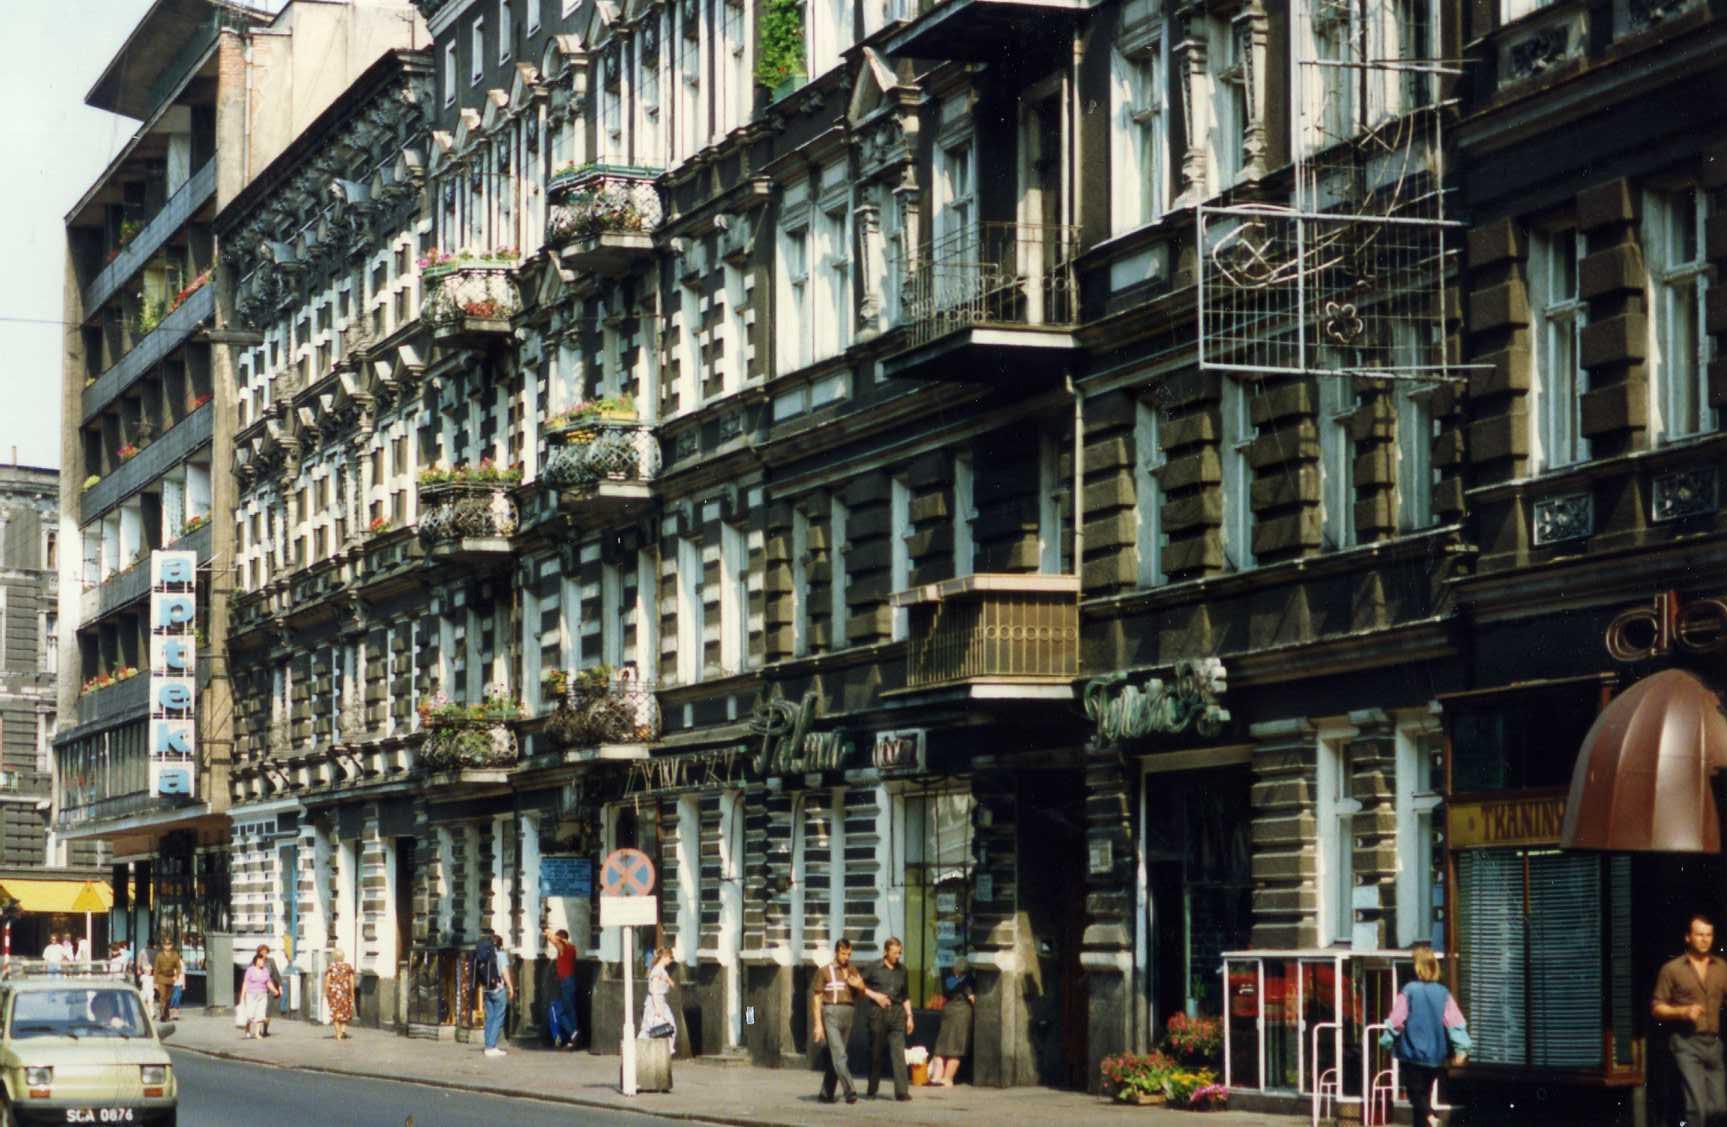 File:A street in Szczecin, Poland, August 1990.jpg - Wikimedia Commons